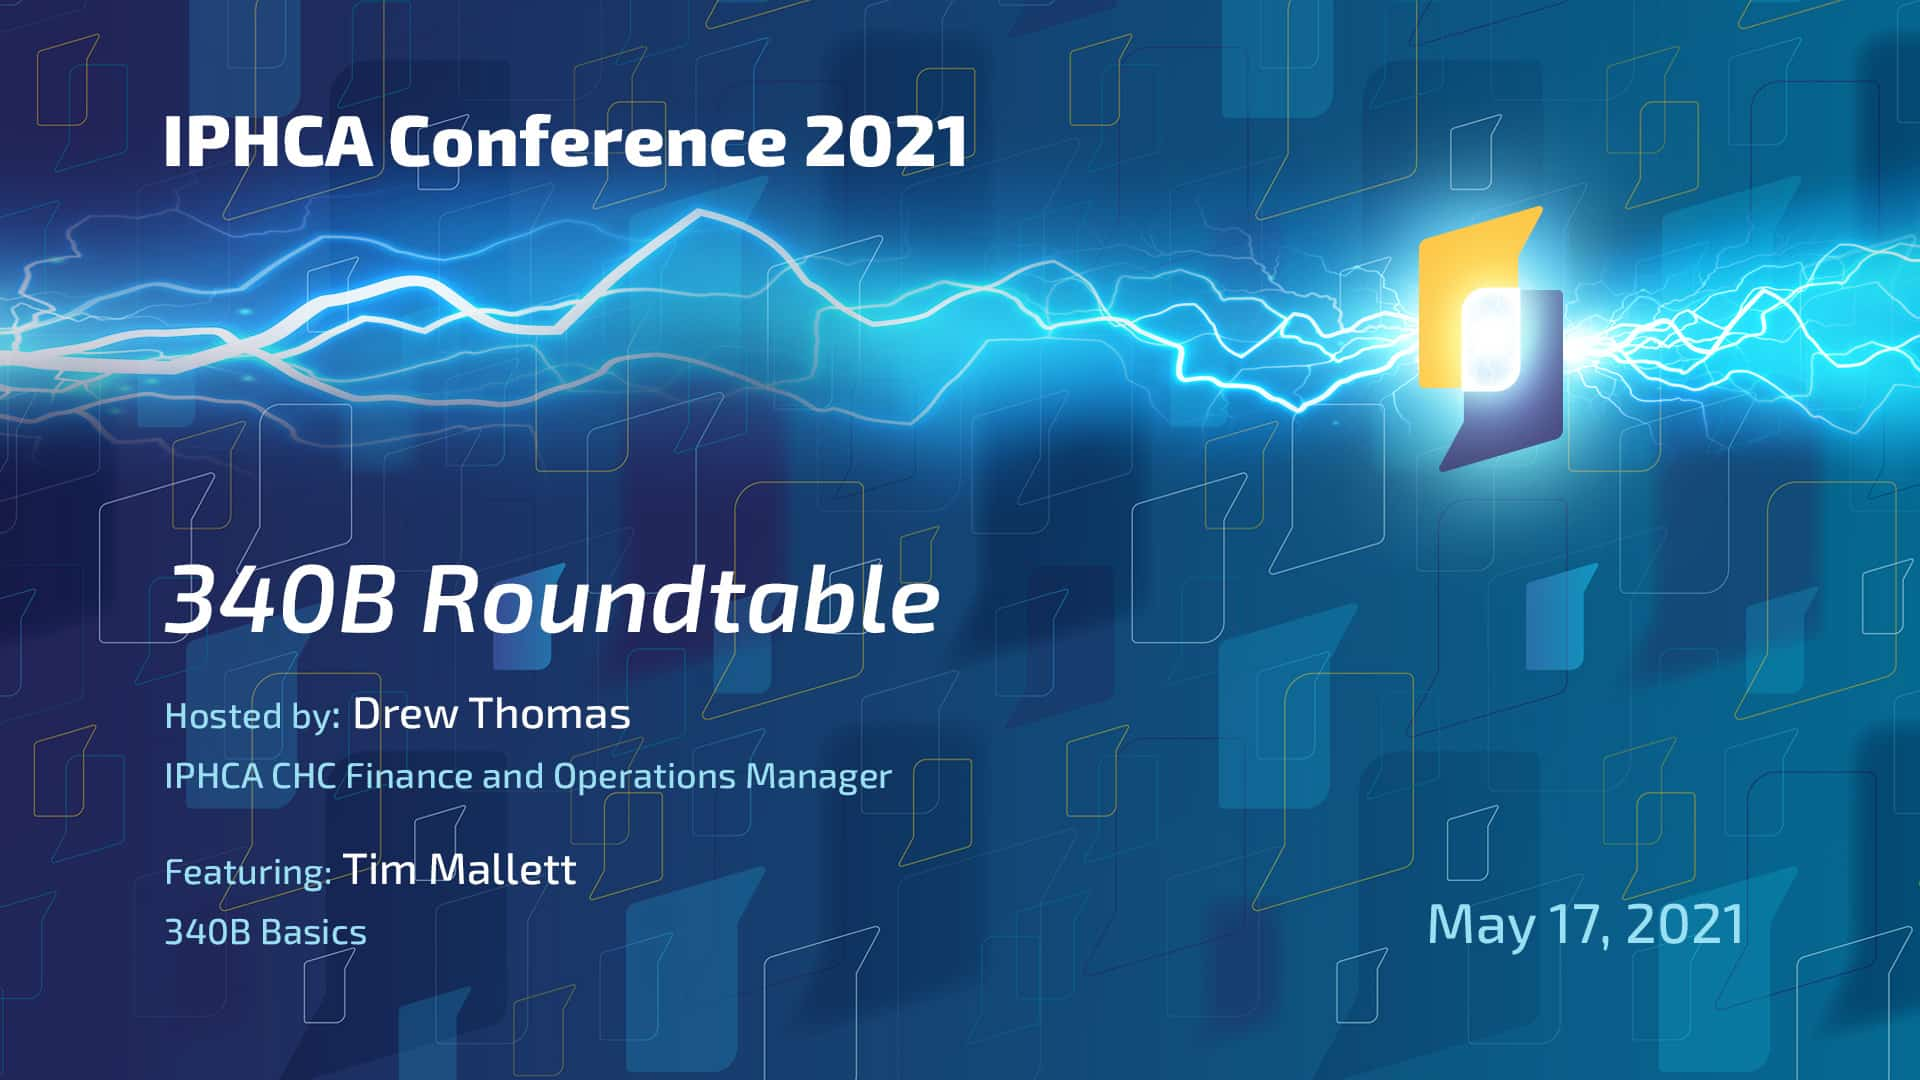 340B roundtable